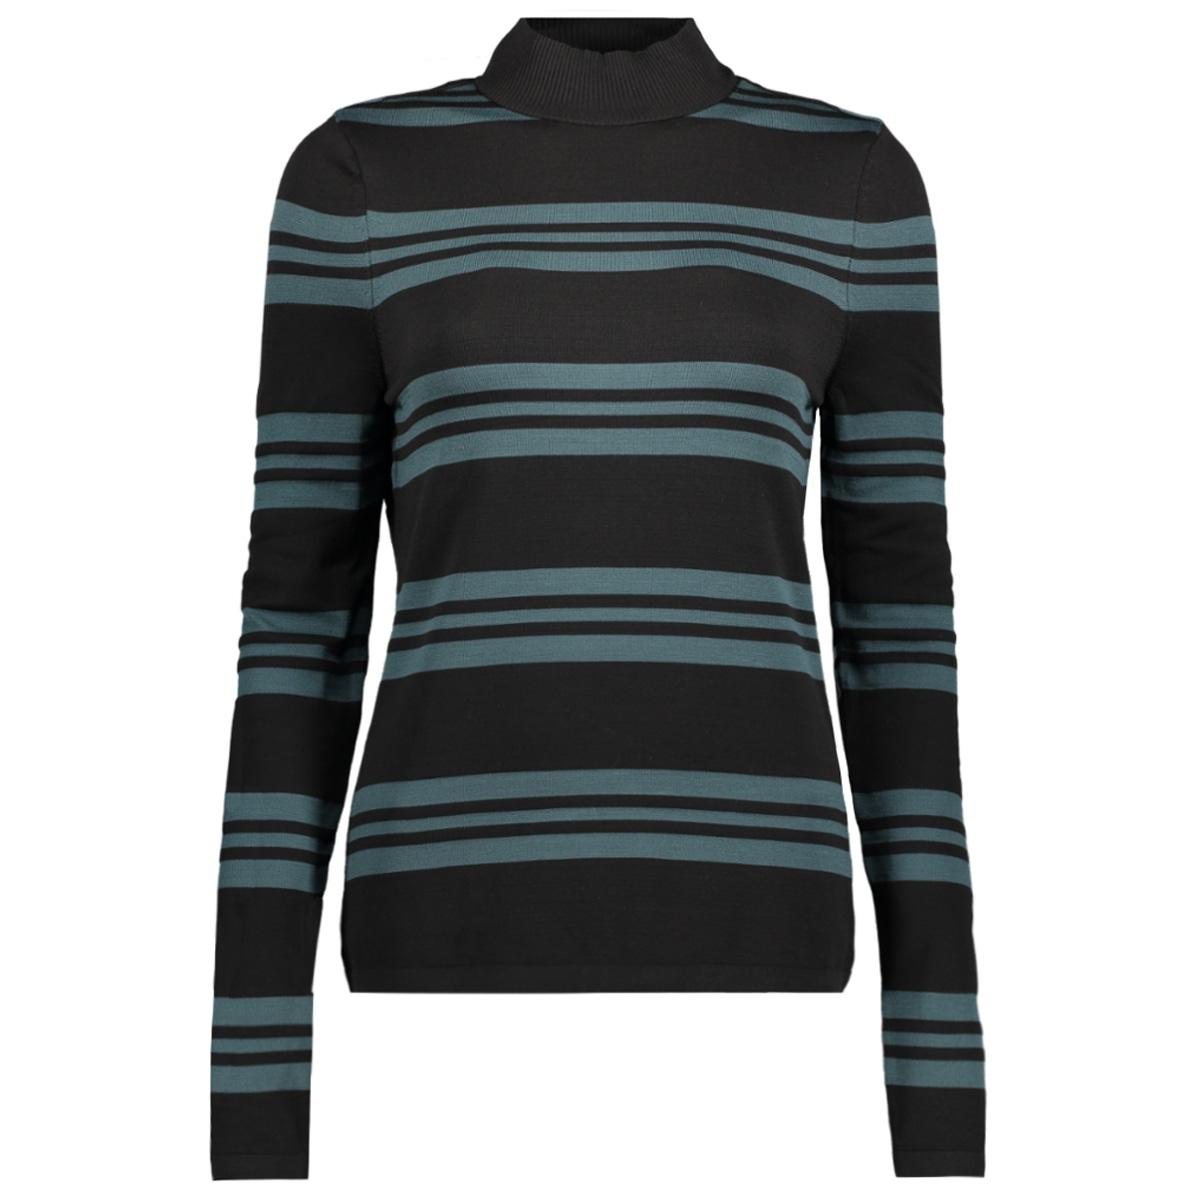 vmsassy ls highneck blouse 10192694 vero moda t-shirt black/ green gables